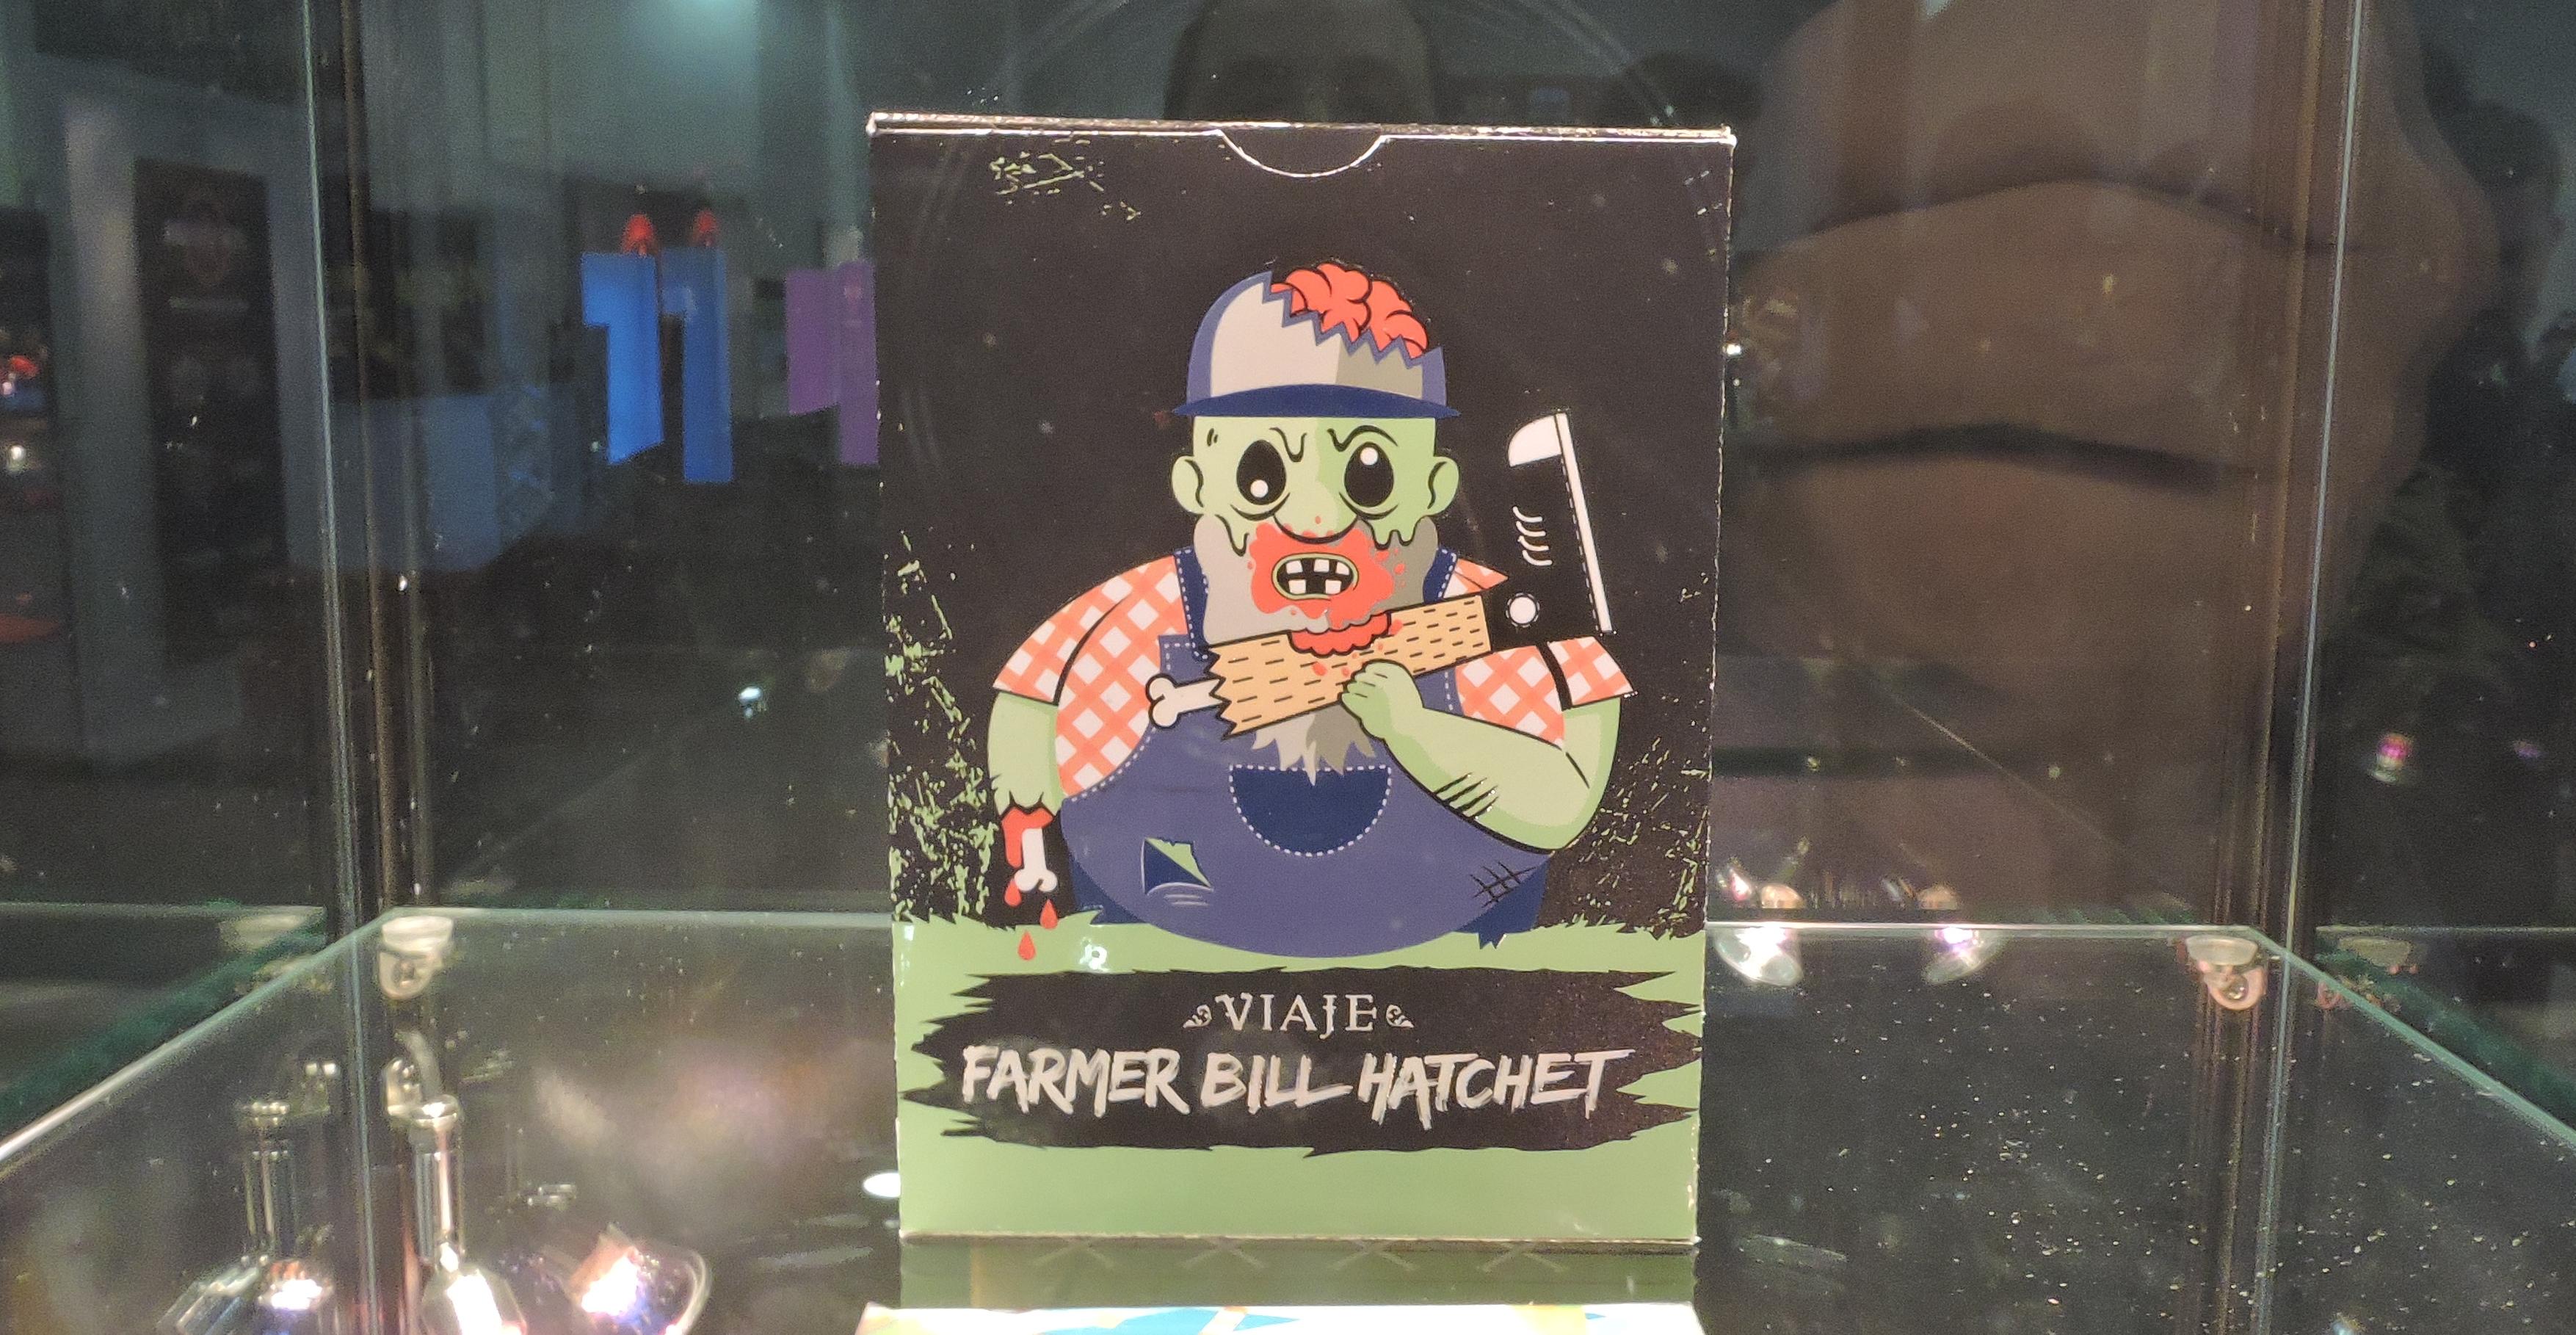 viaje_farmer_bill_hatchet_zombie